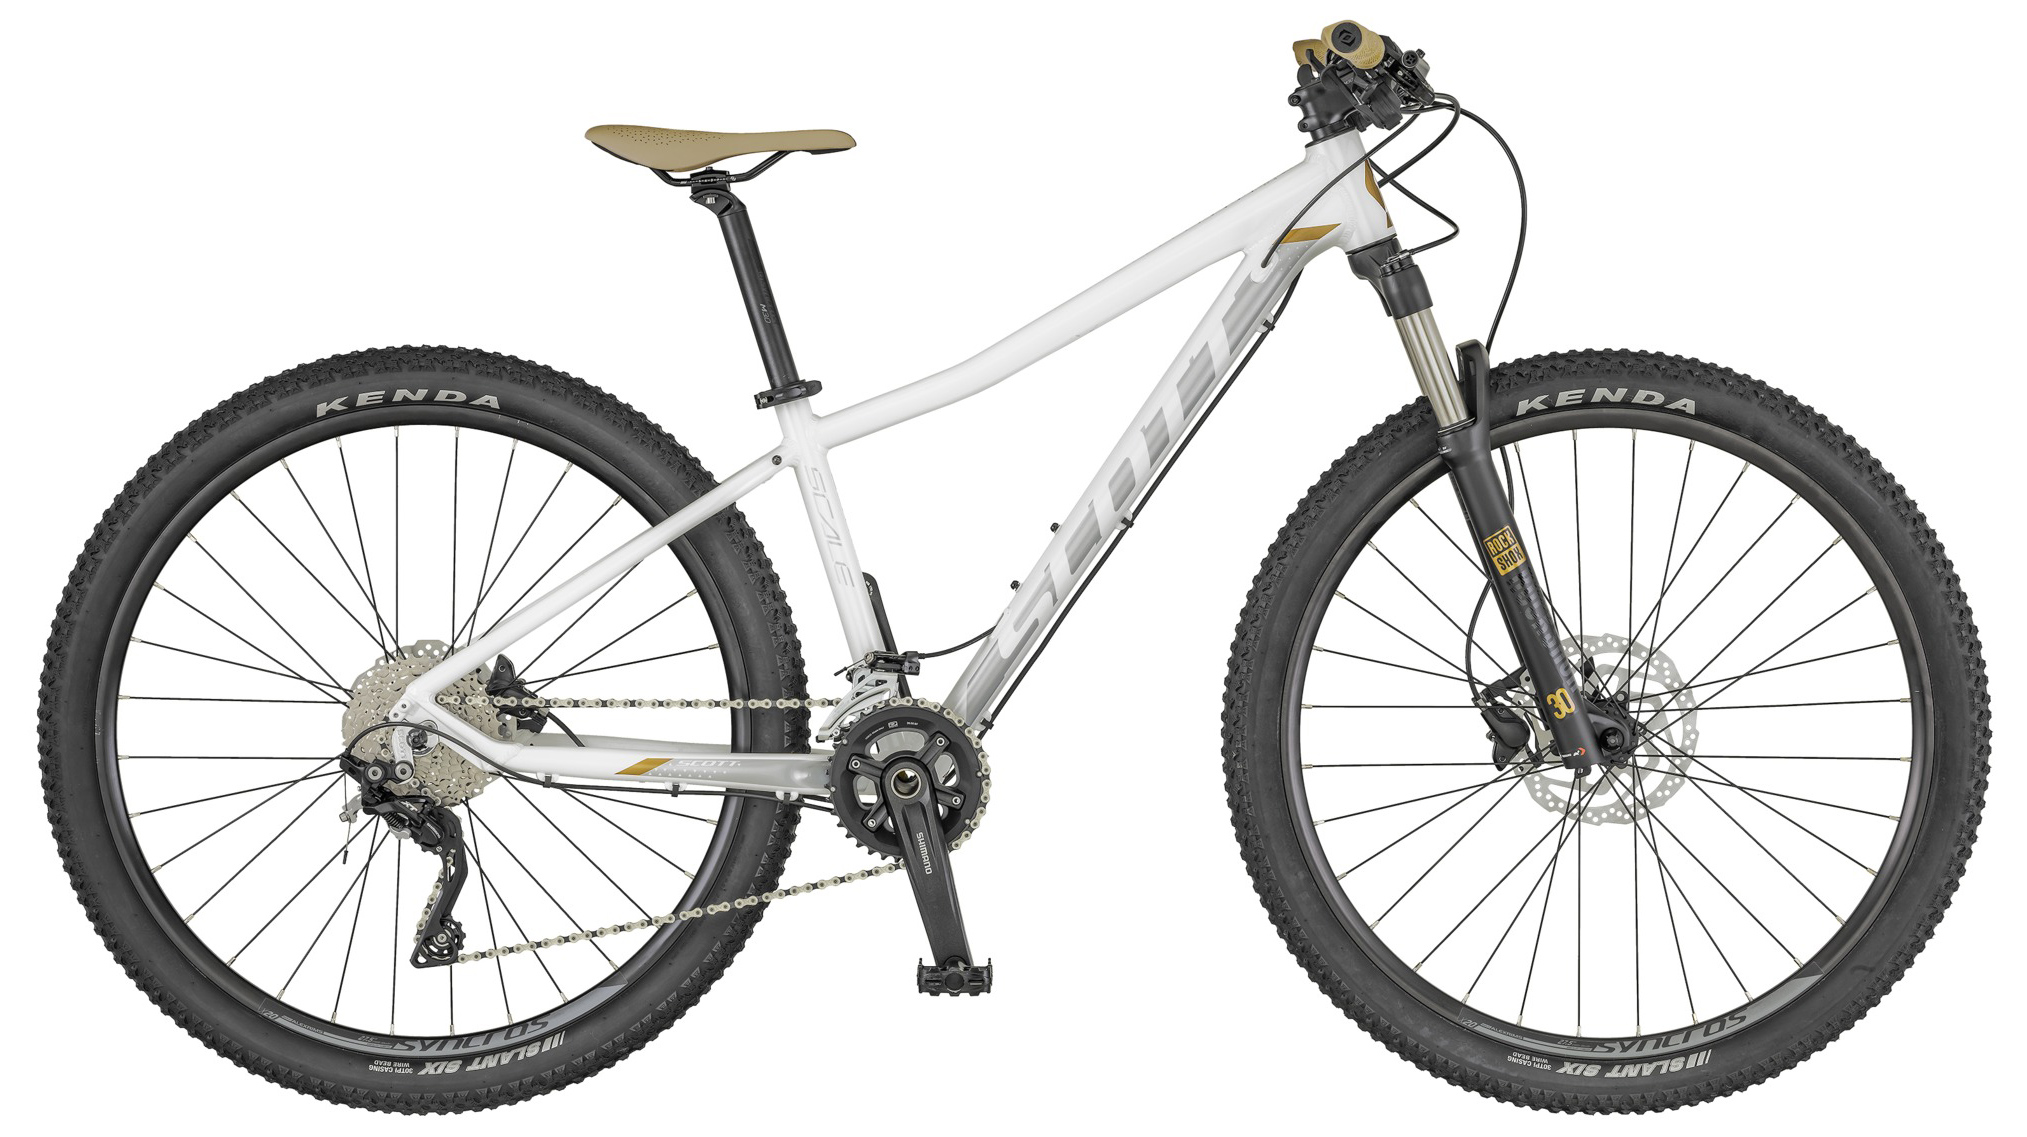 цена на Велосипед Scott Contessa Scale 20 2019